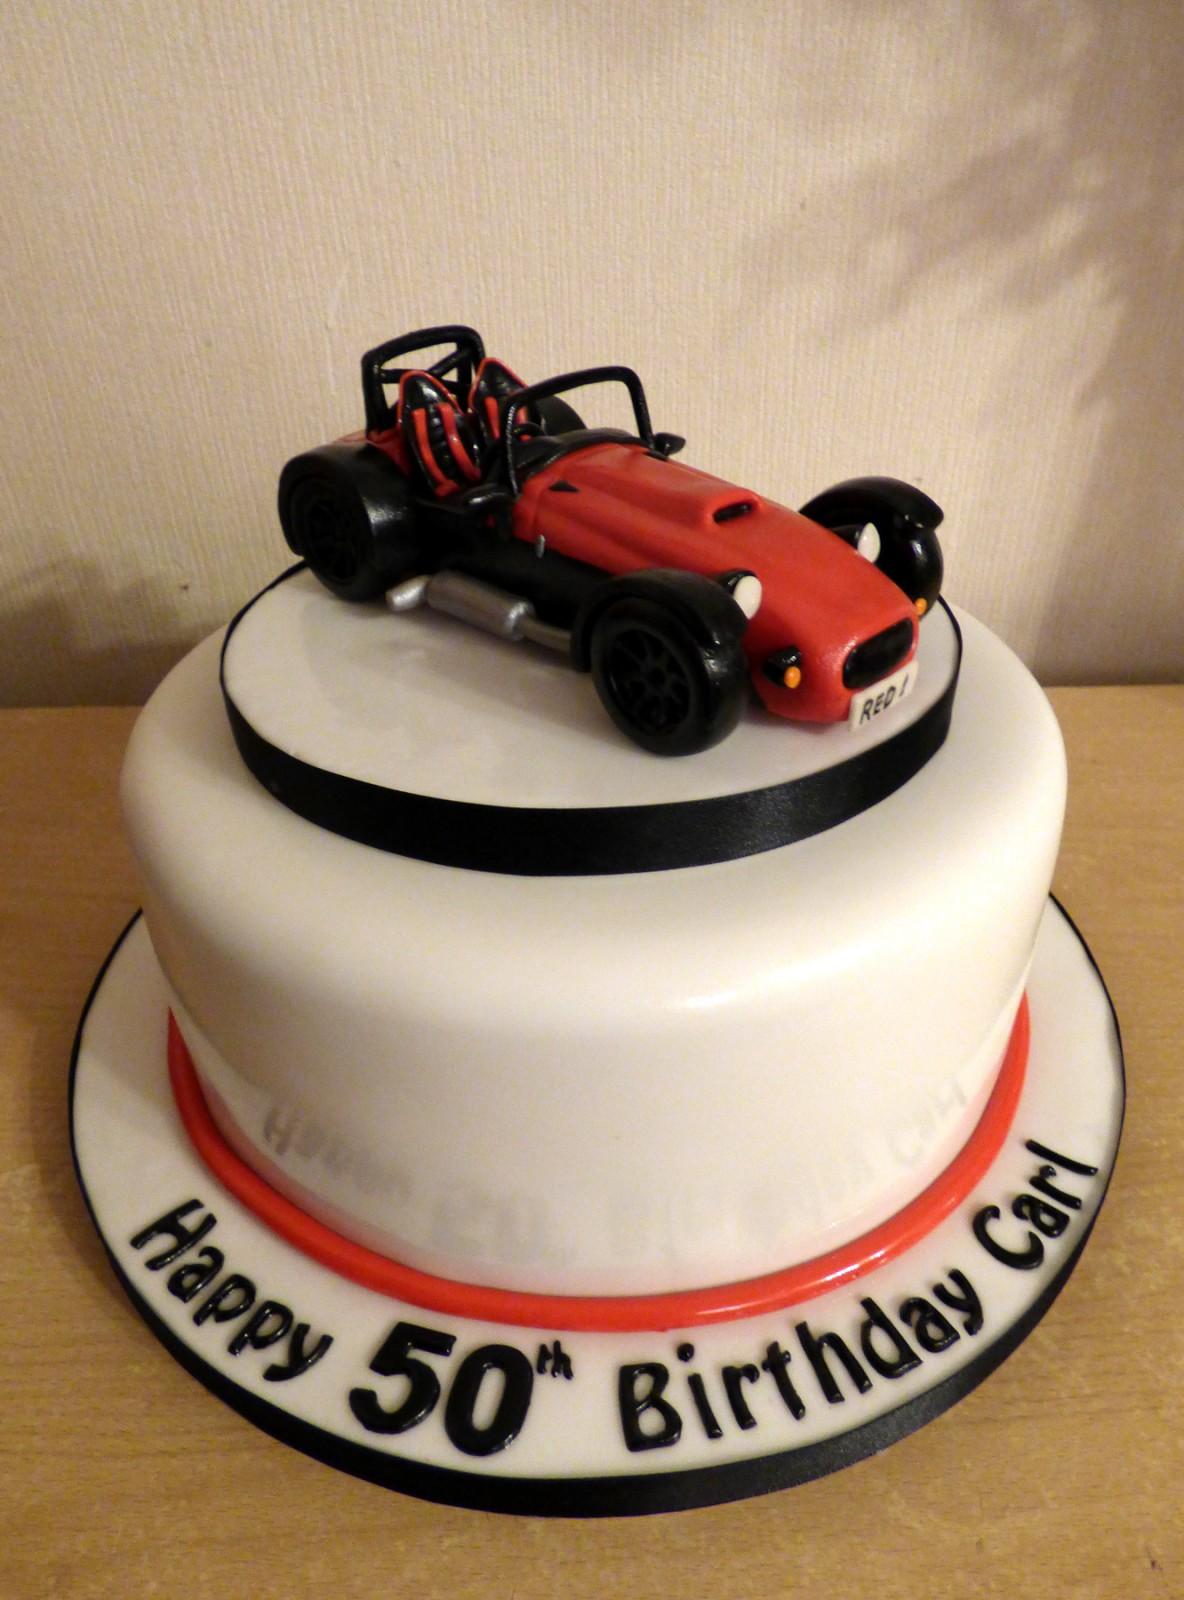 Superb Westfield Kit Car Birthday Cake Susies Cakes Personalised Birthday Cards Cominlily Jamesorg